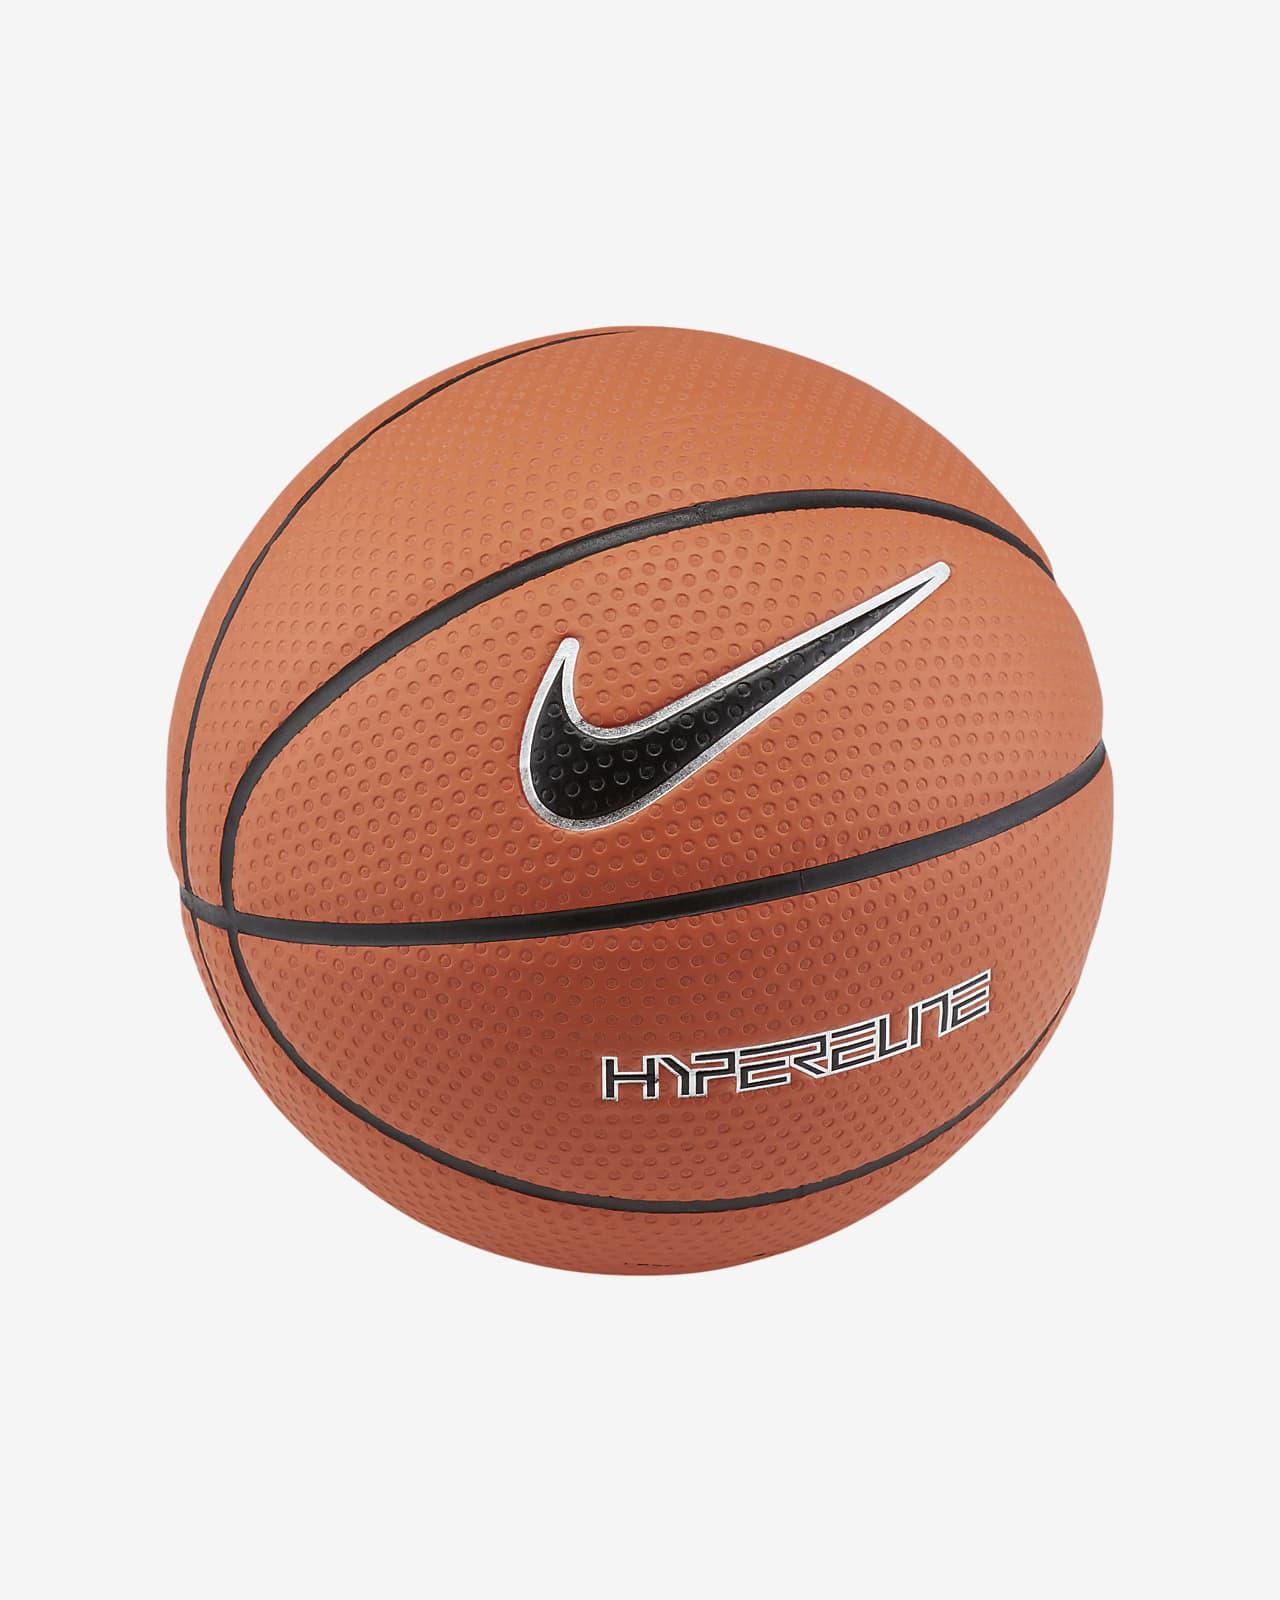 Nike Hyper Elite 8p Basketball Size 6 And 7 Nike Jp